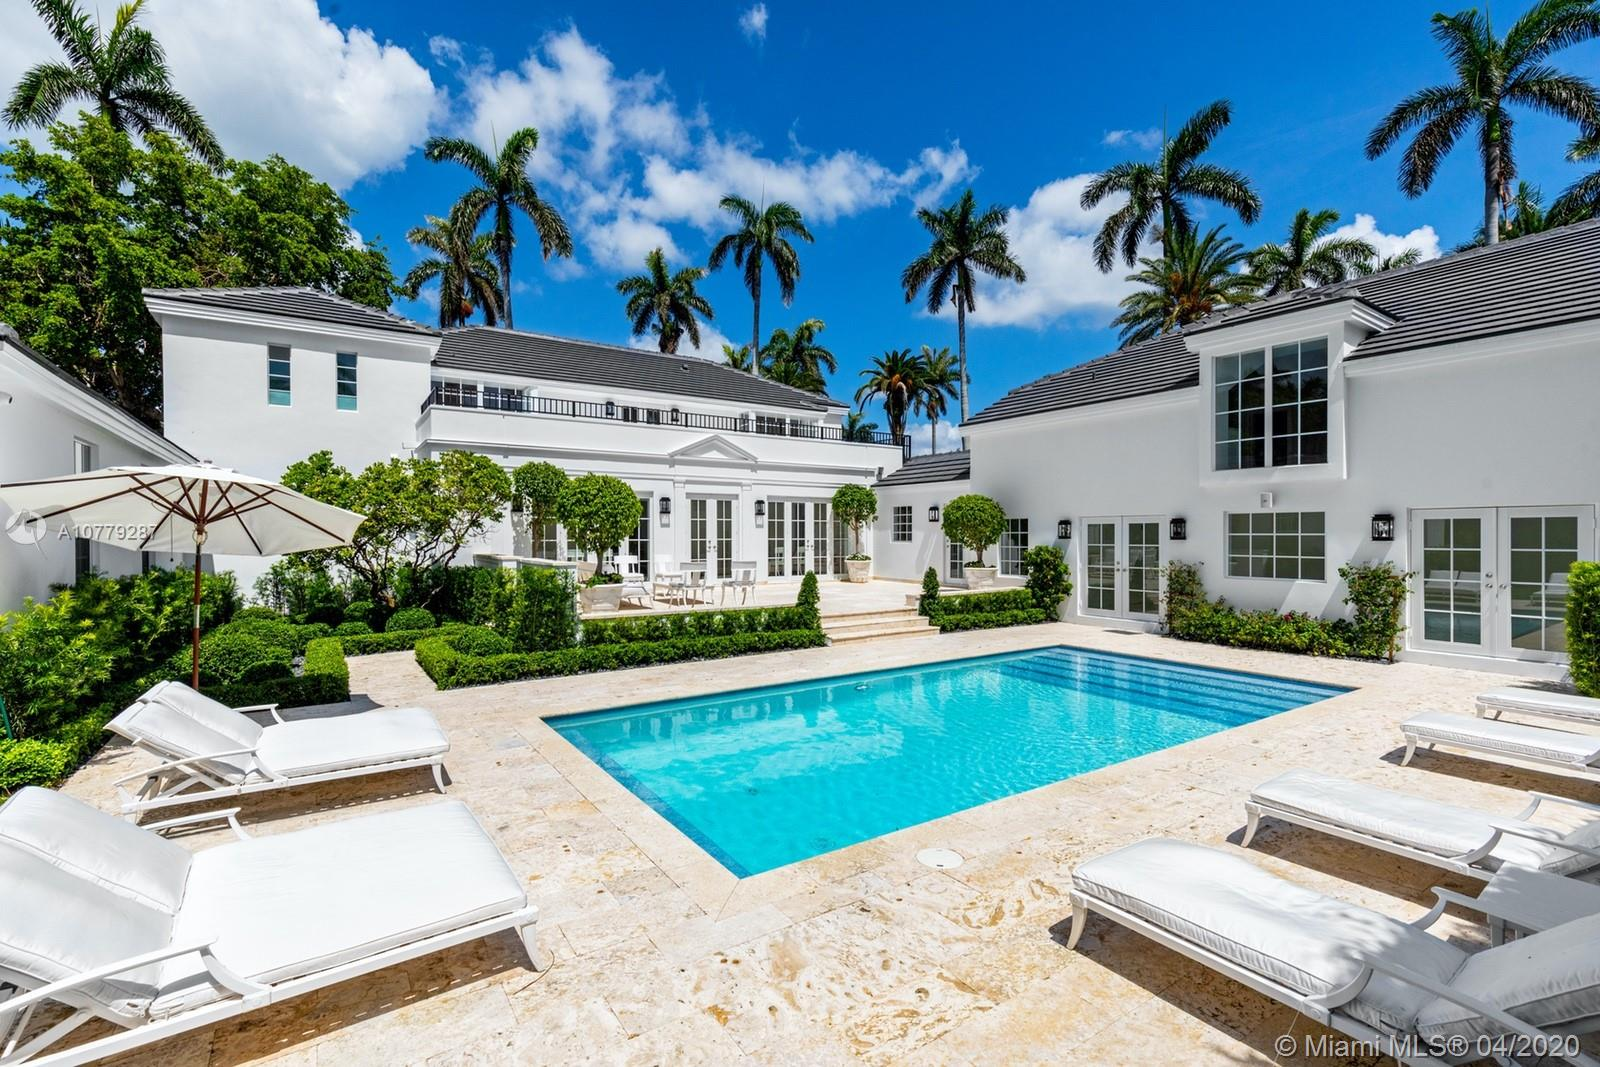 6695 Roxbury Ln, Miami Beach, FL 33141